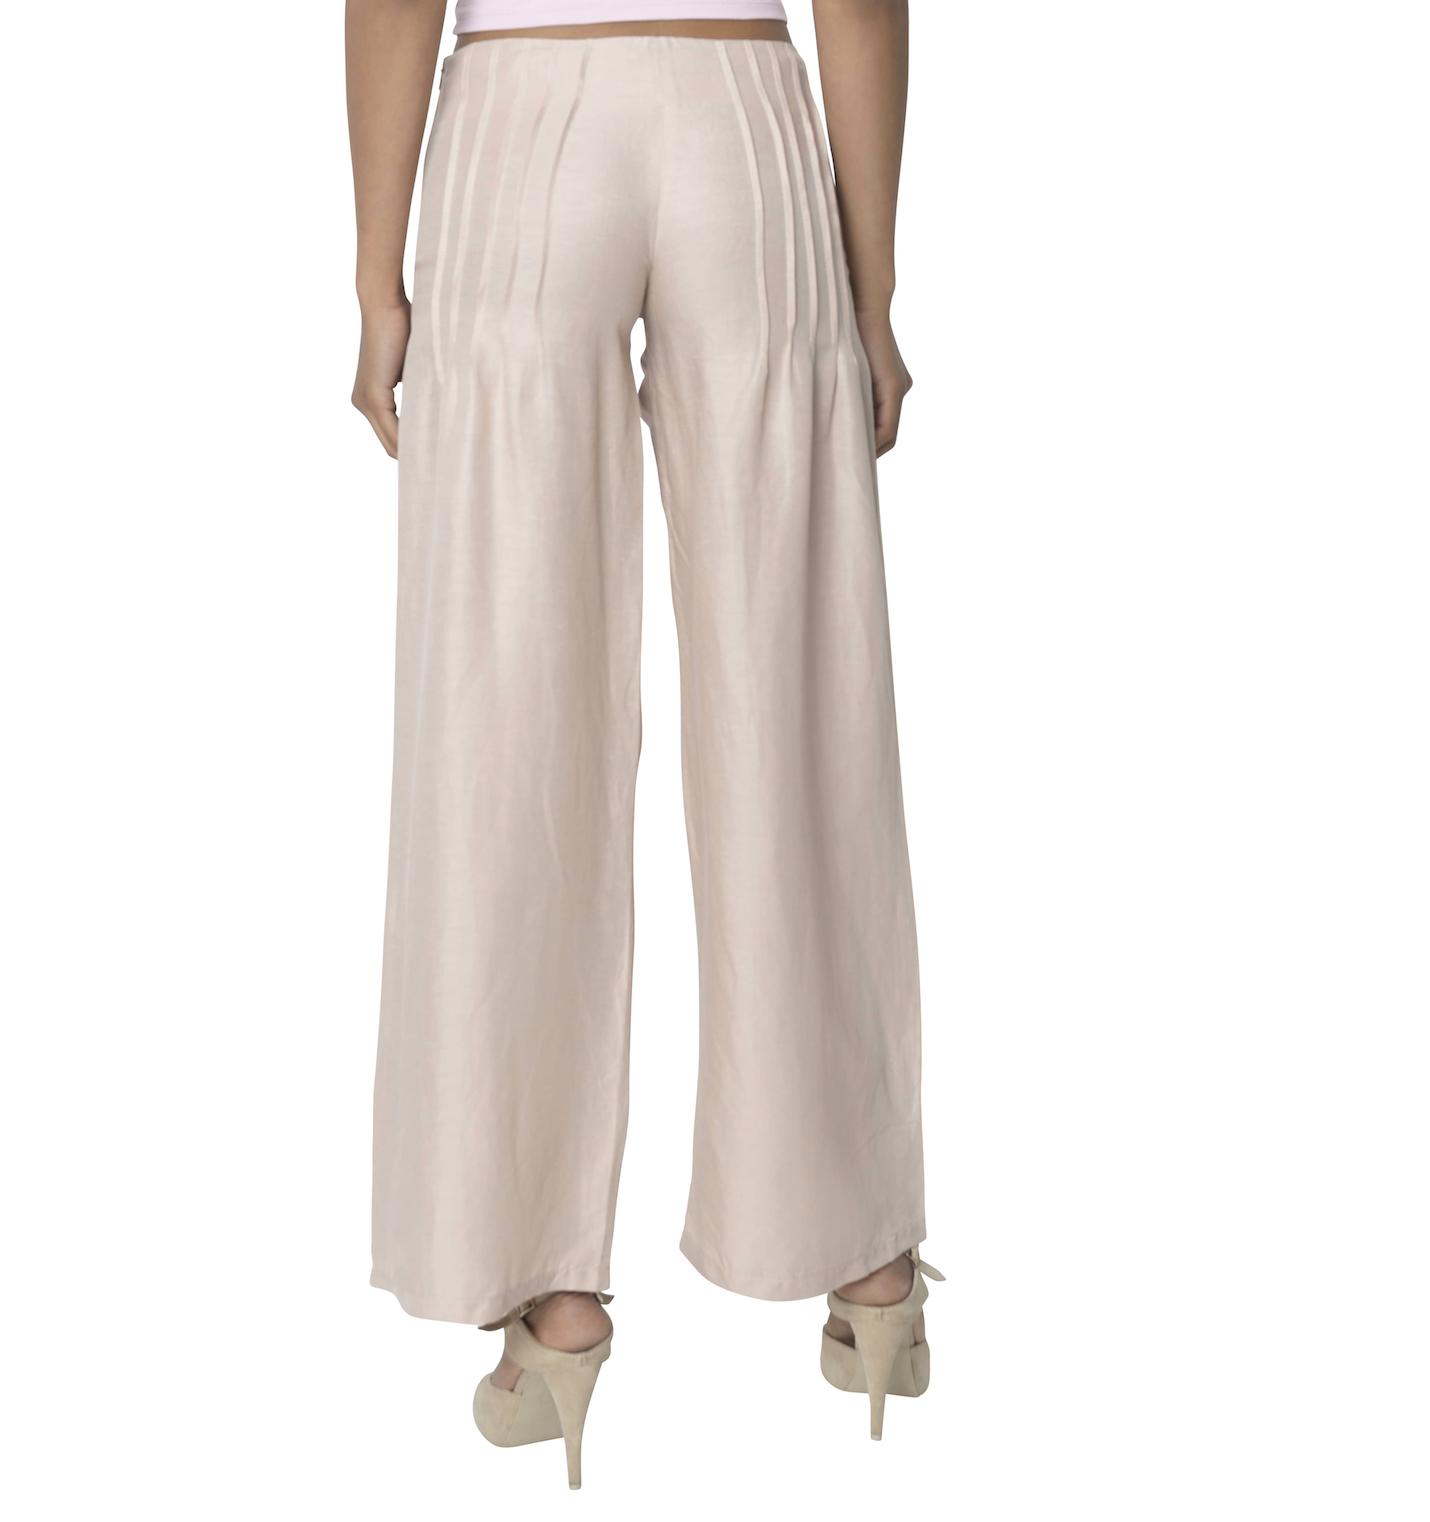 Trousers ATHEBYNE 1